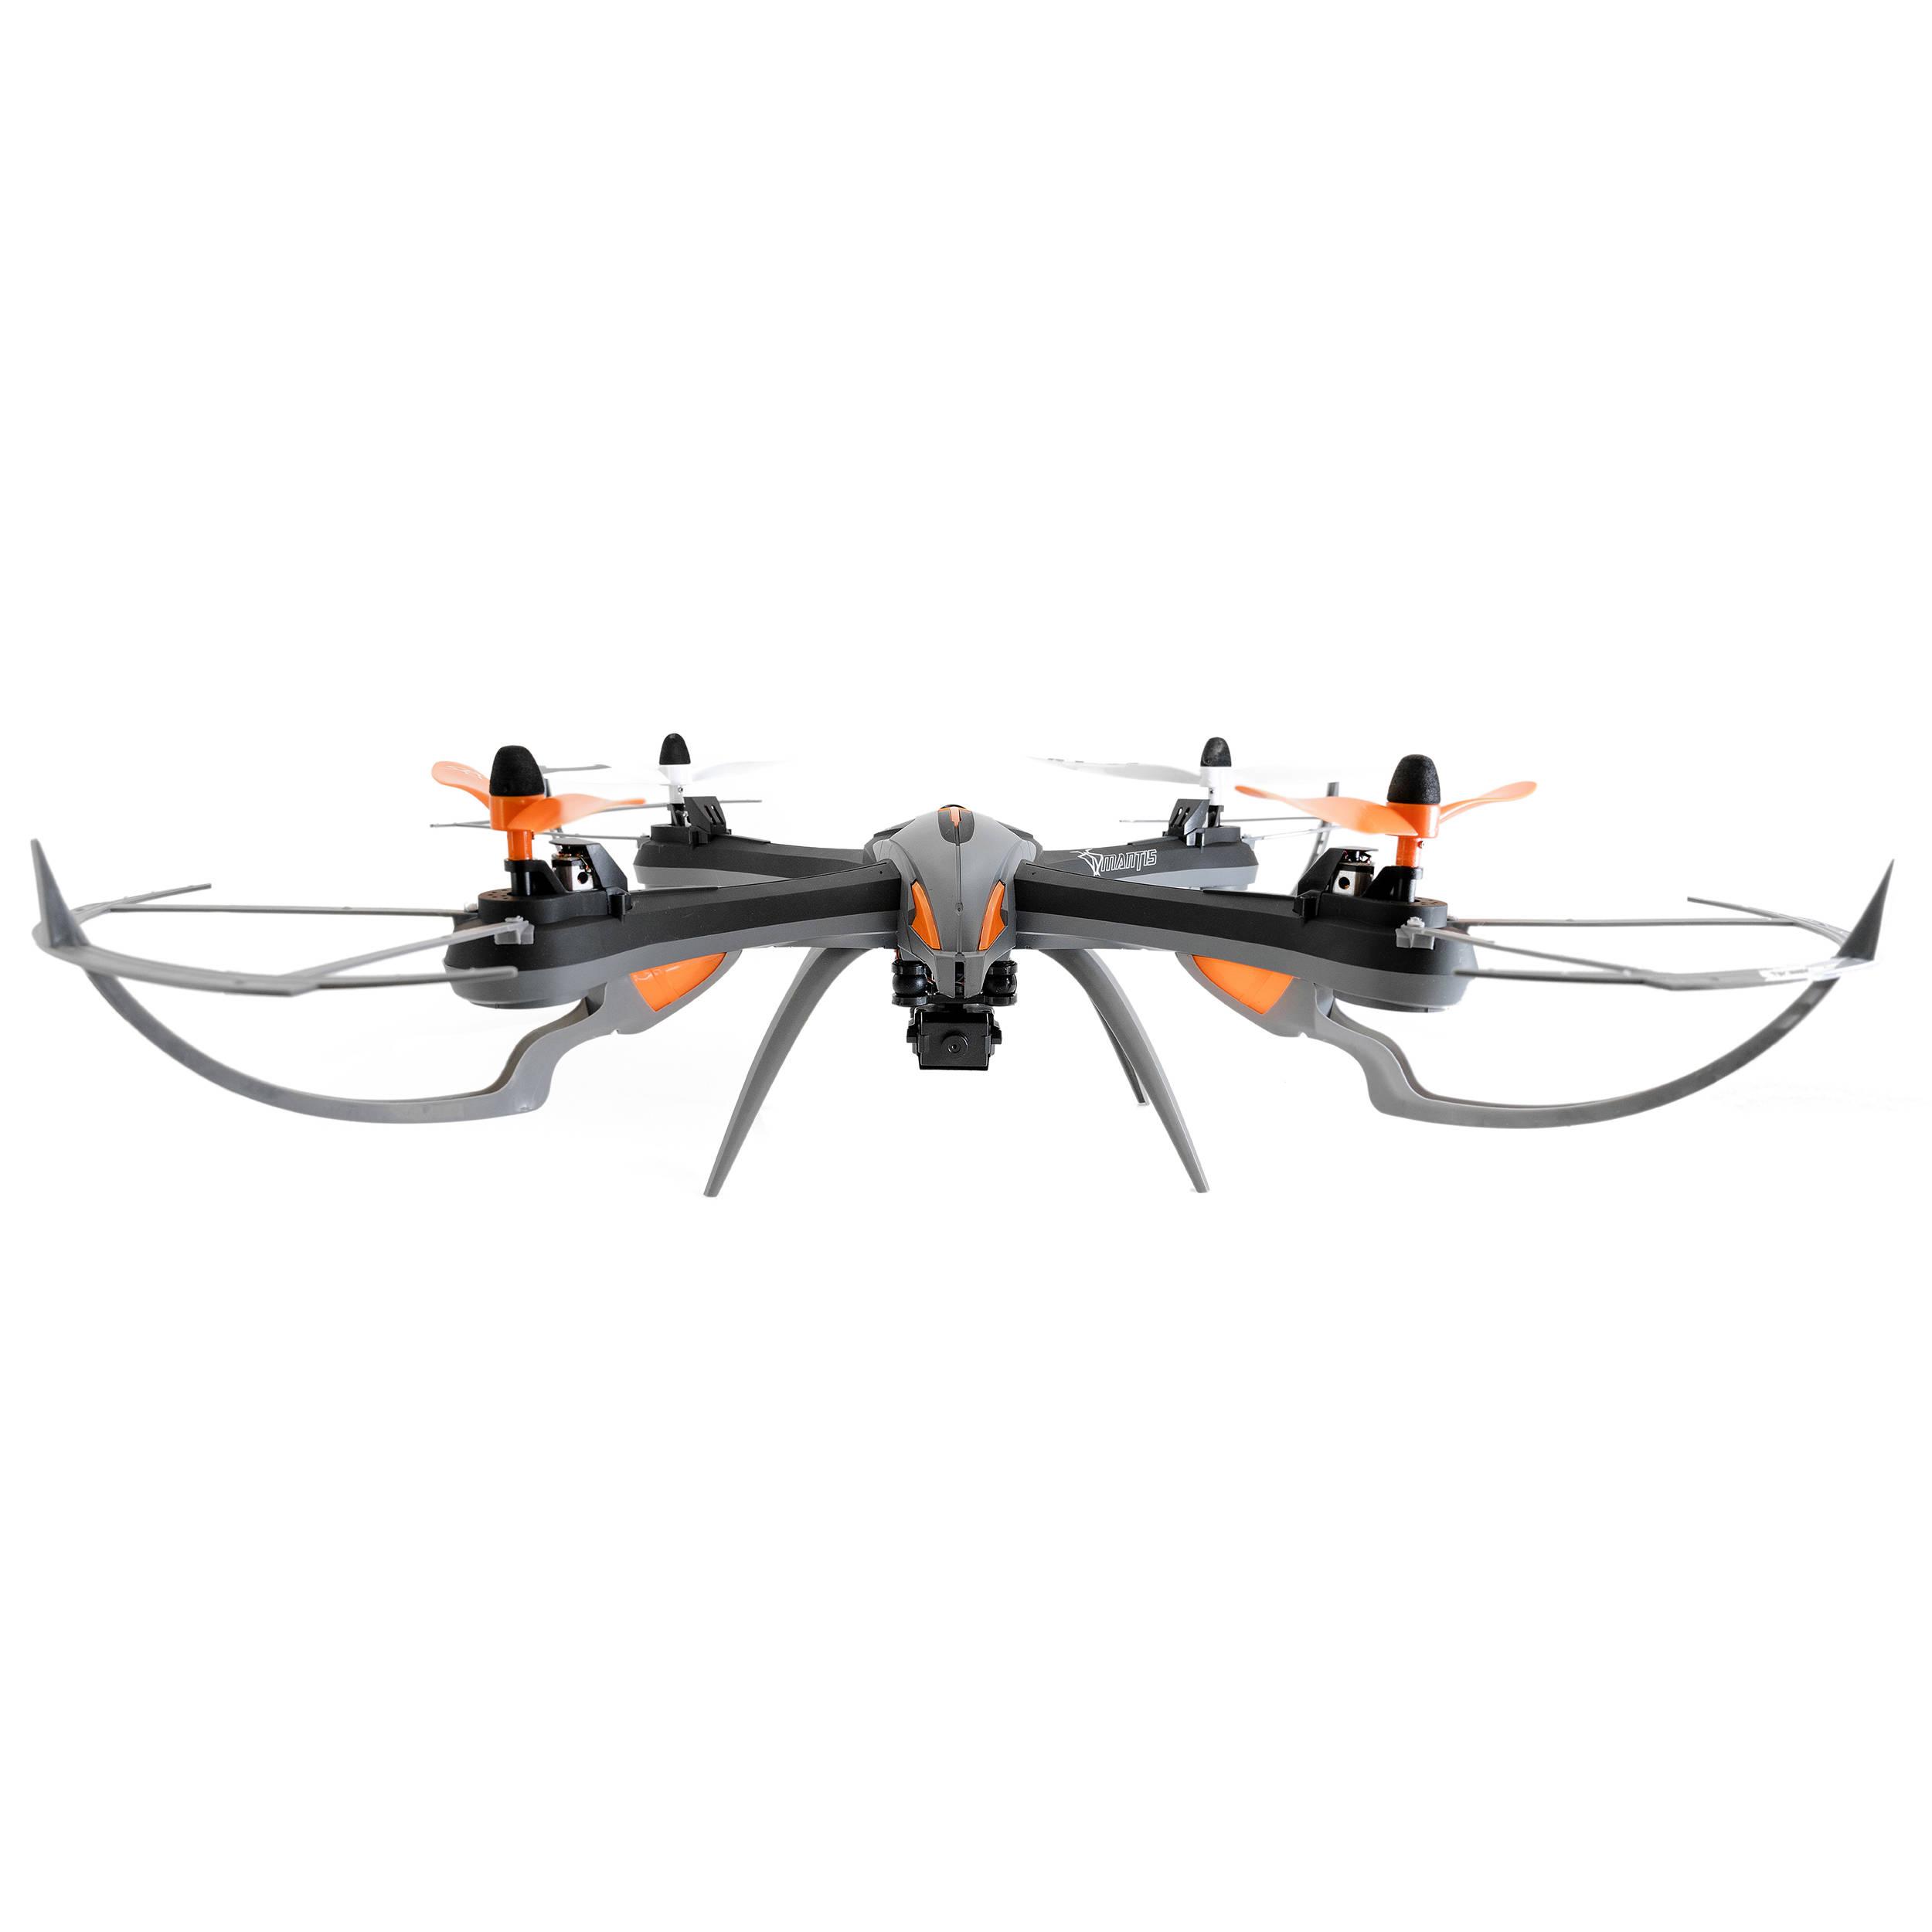 snakebyte Zoopa Q600 Mantis 3D Quadcopter ZQ601 B&H Photo